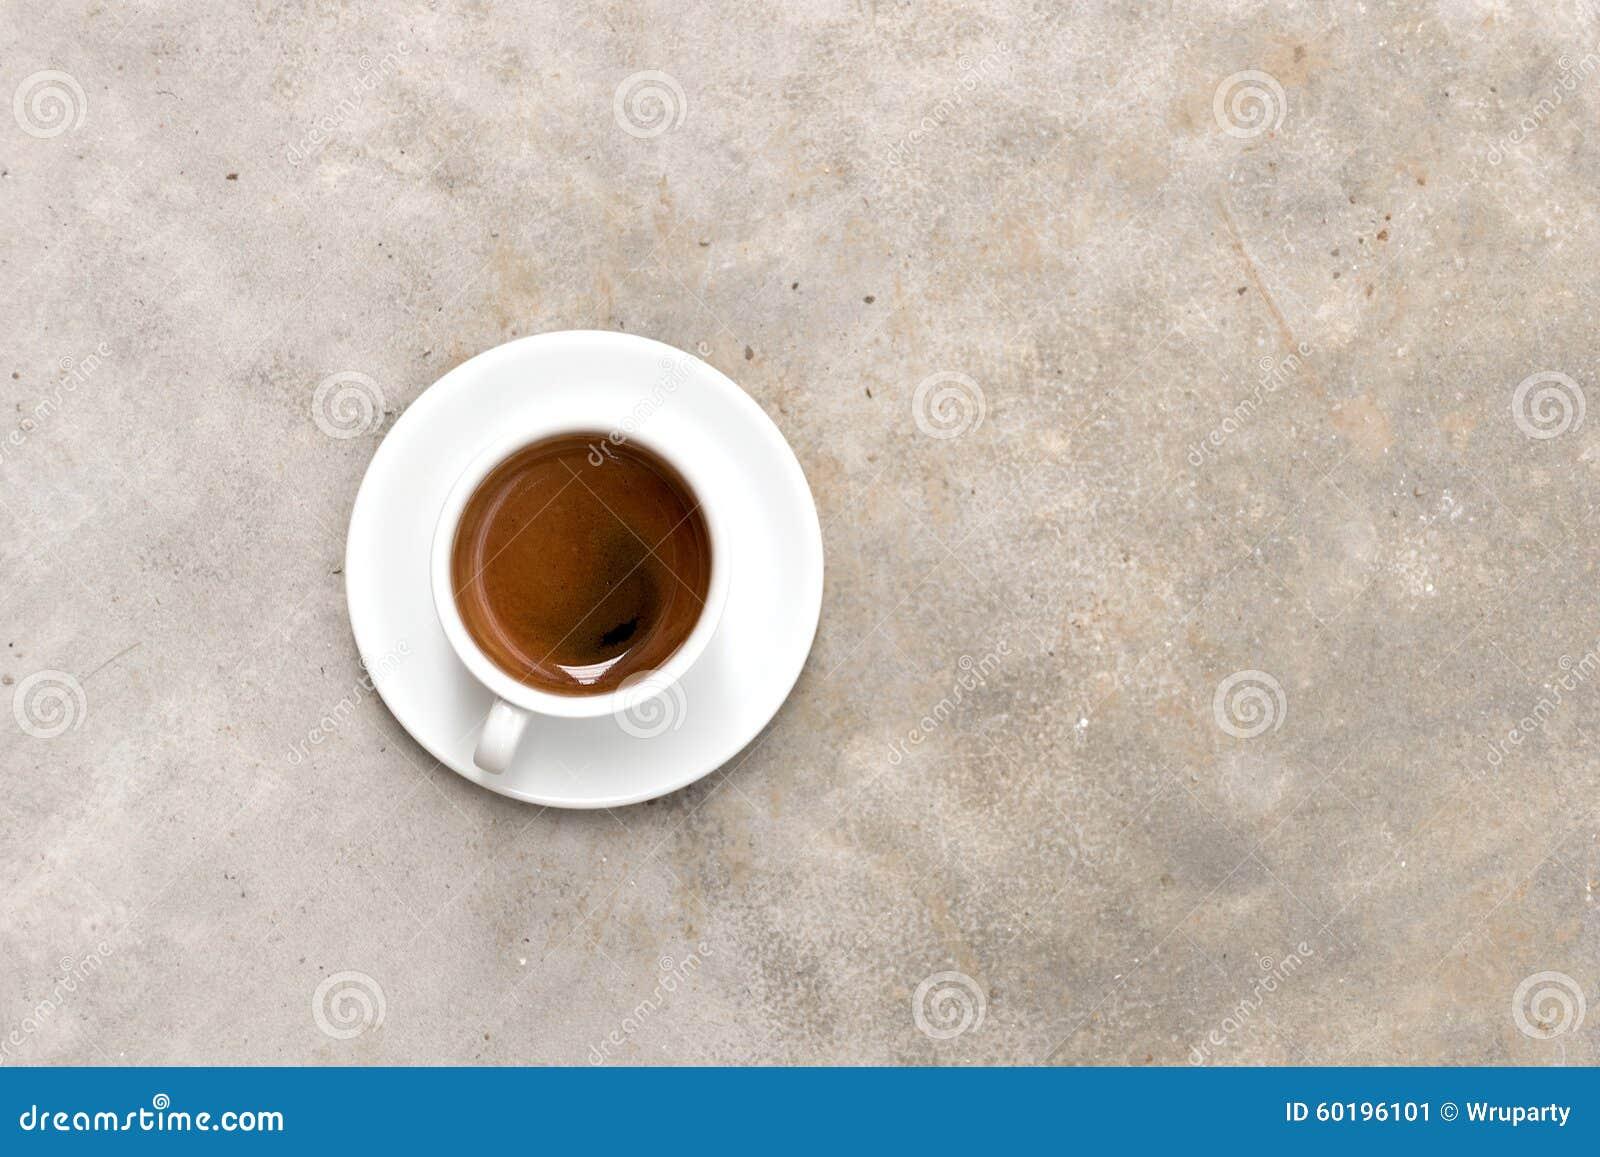 how to make white coffee espresso